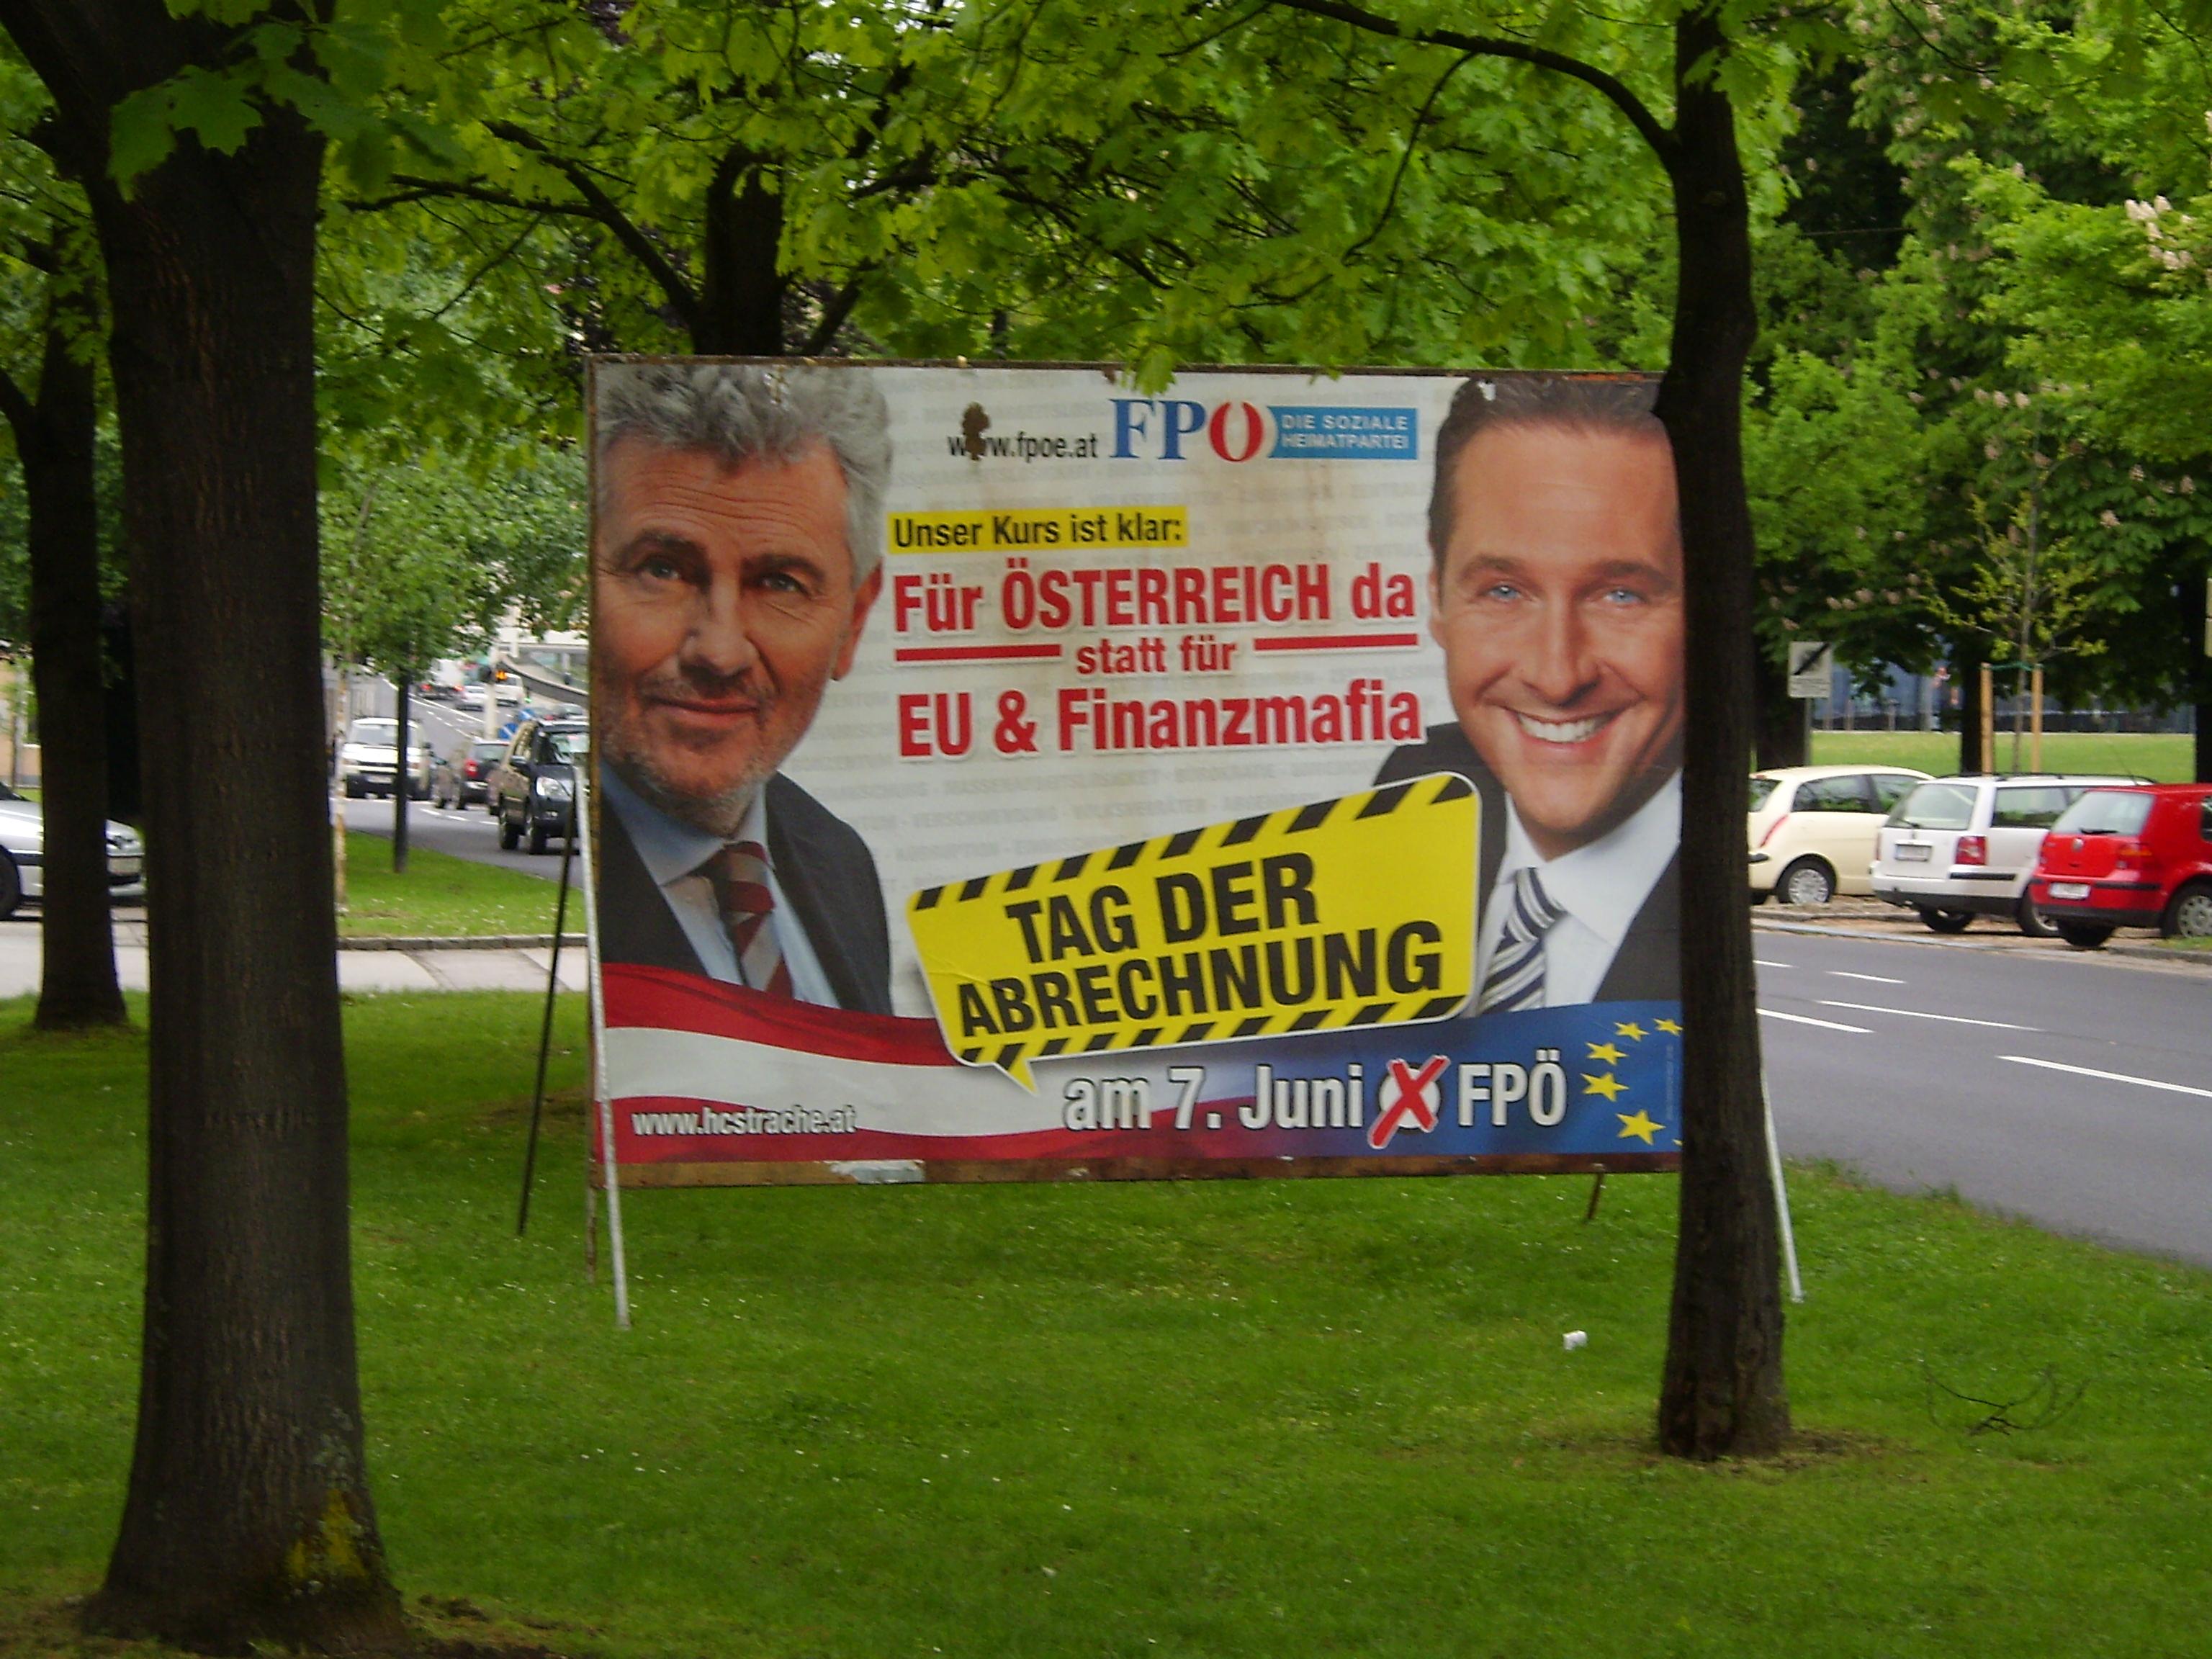 FPÖ Plakat Europawahl